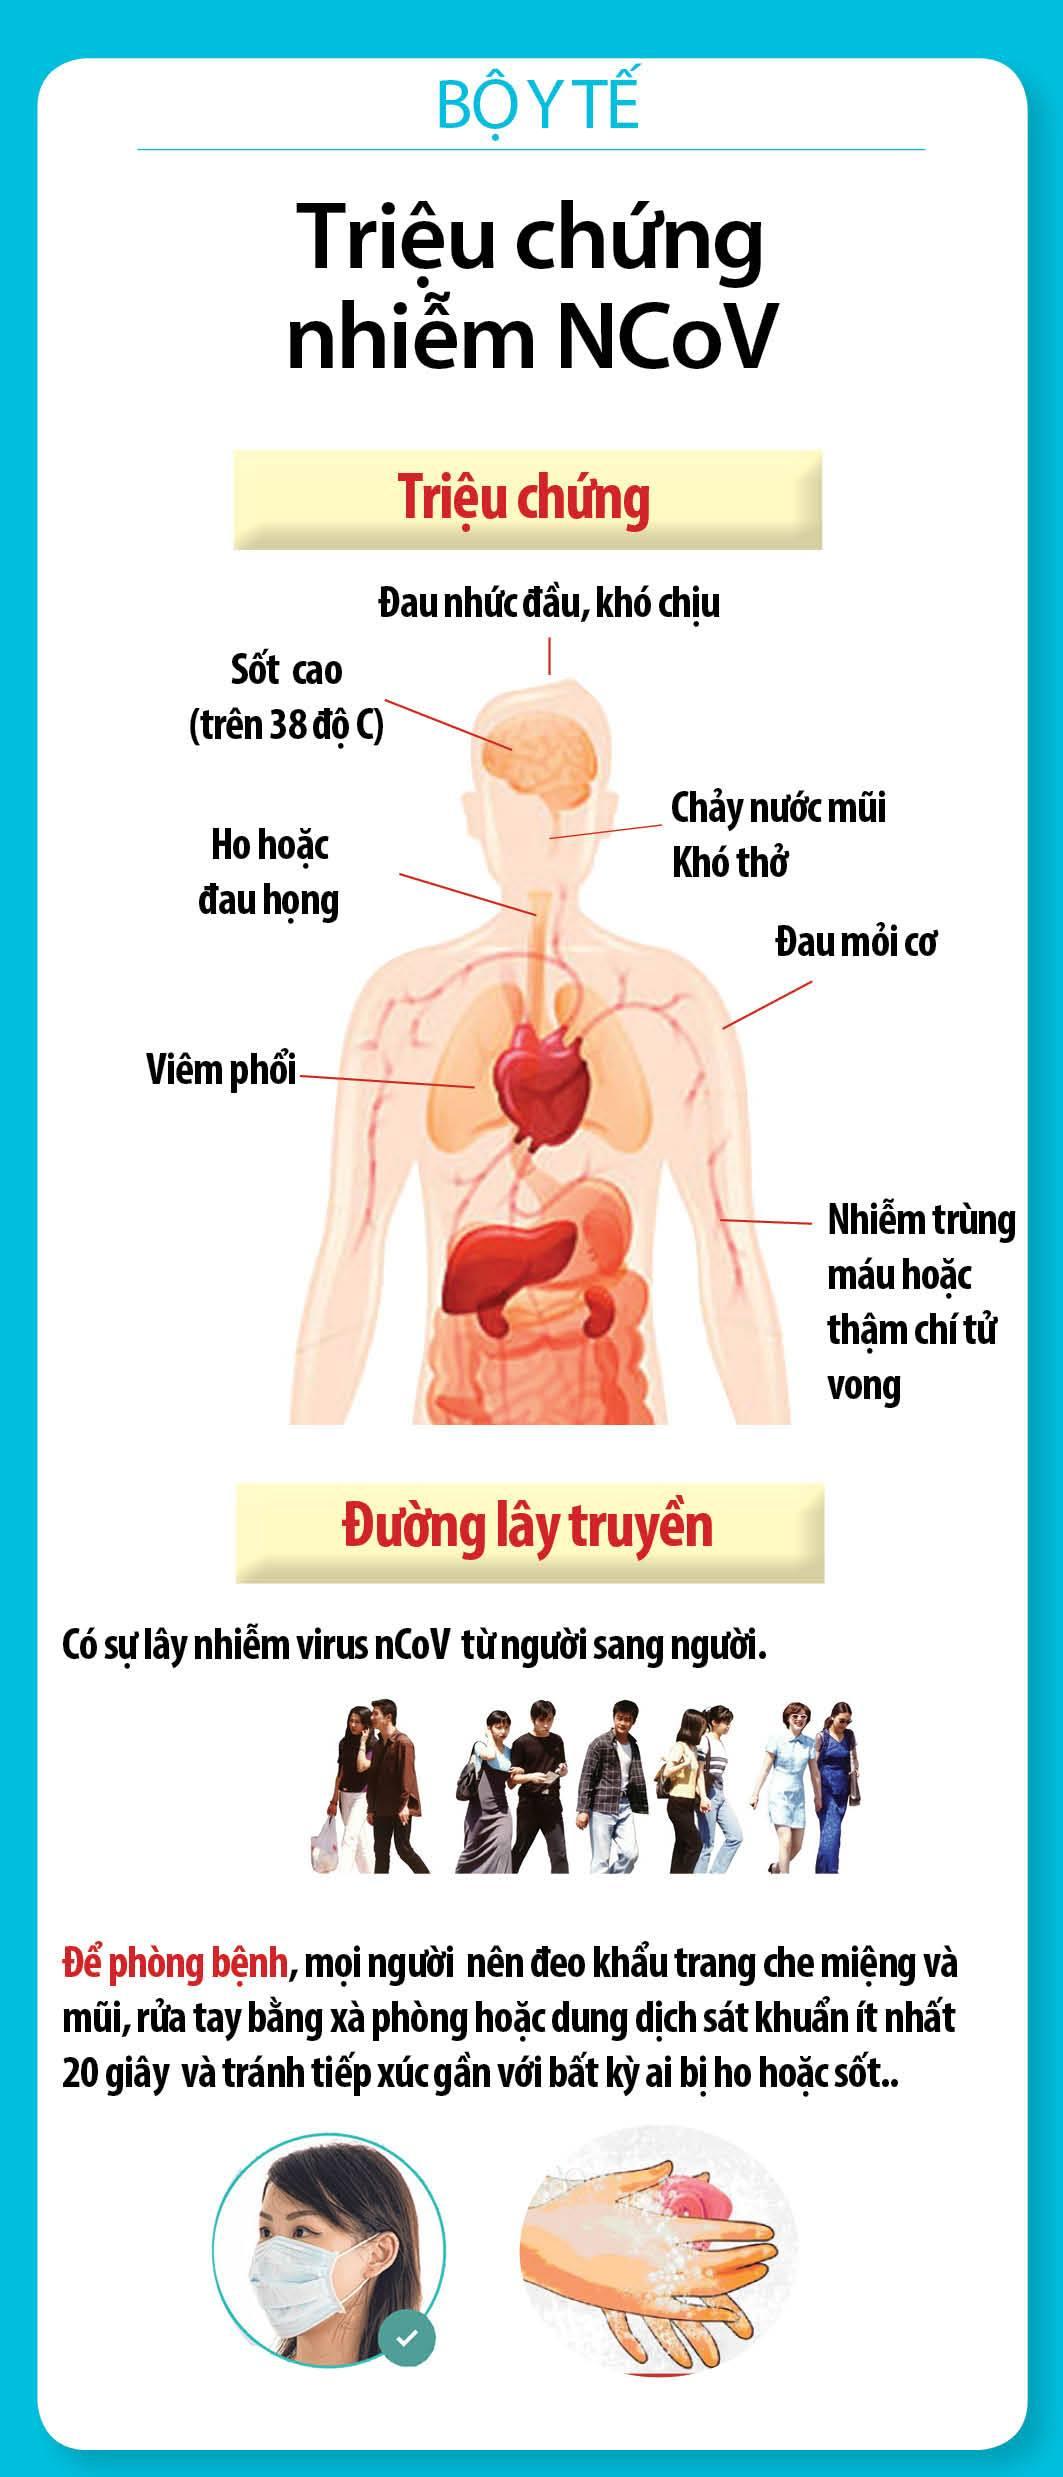 Triệu chứng nhiễm nCoV